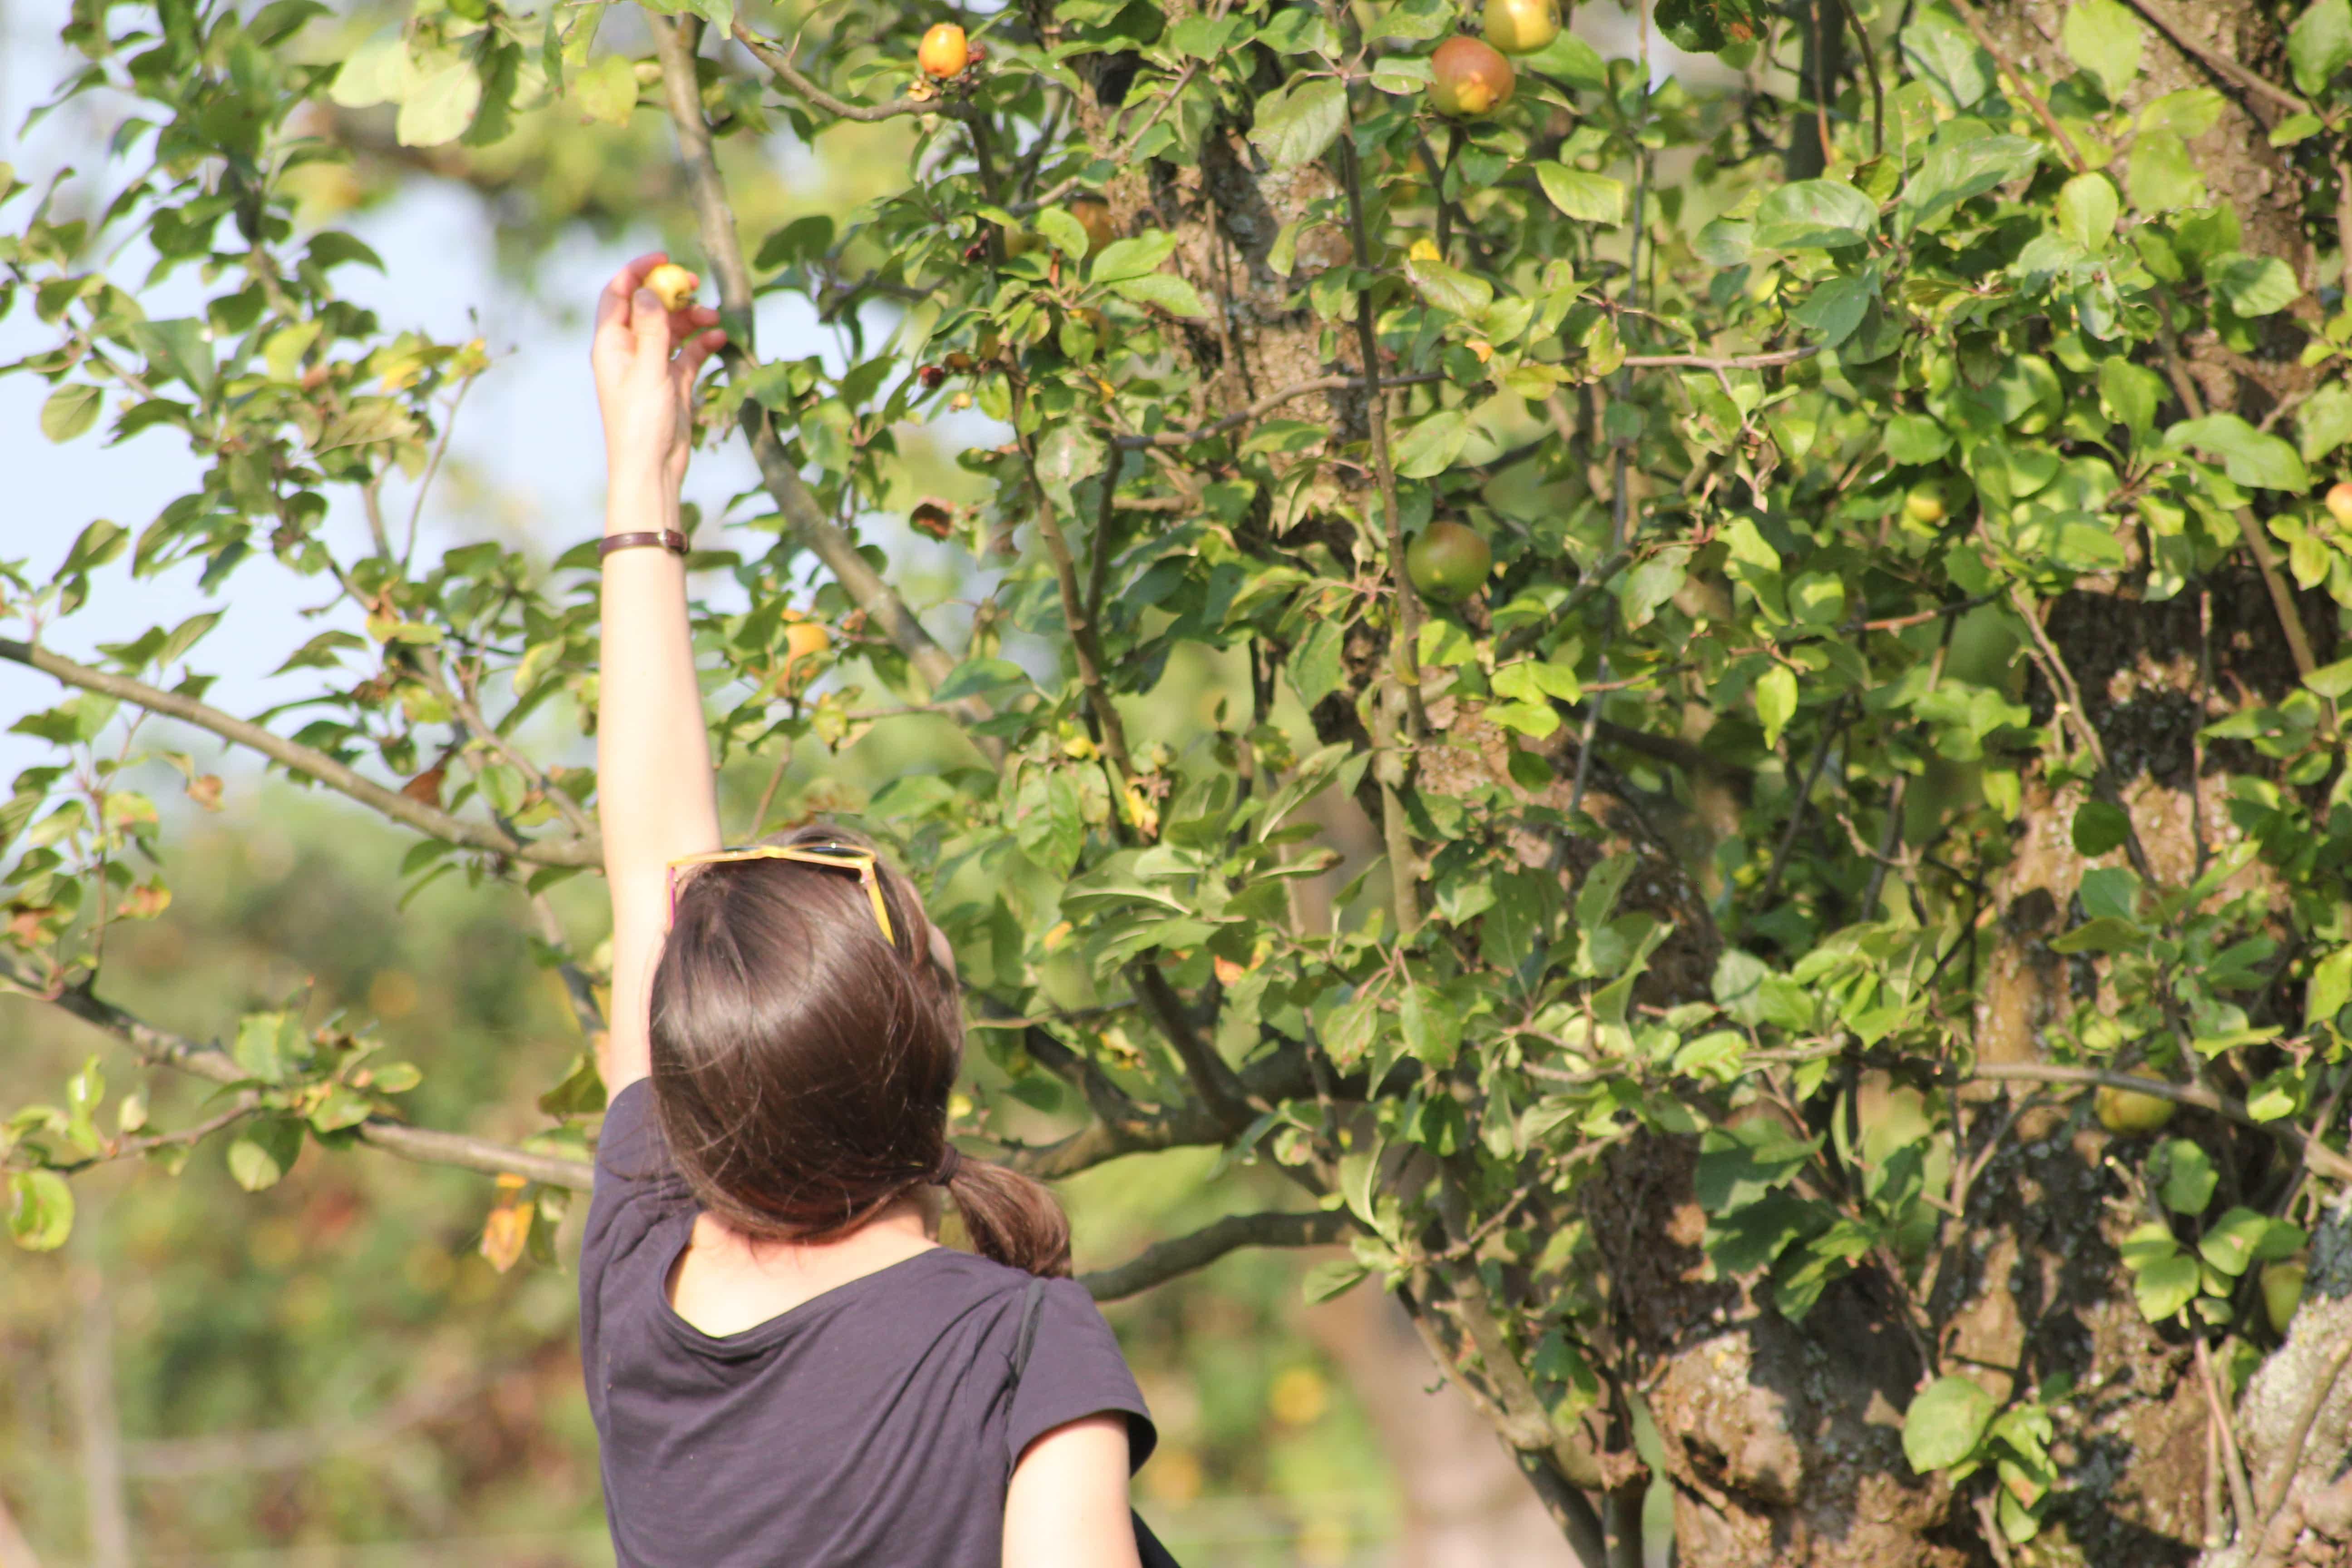 Frau pflückt Apfel vom Baum // HIMBEER